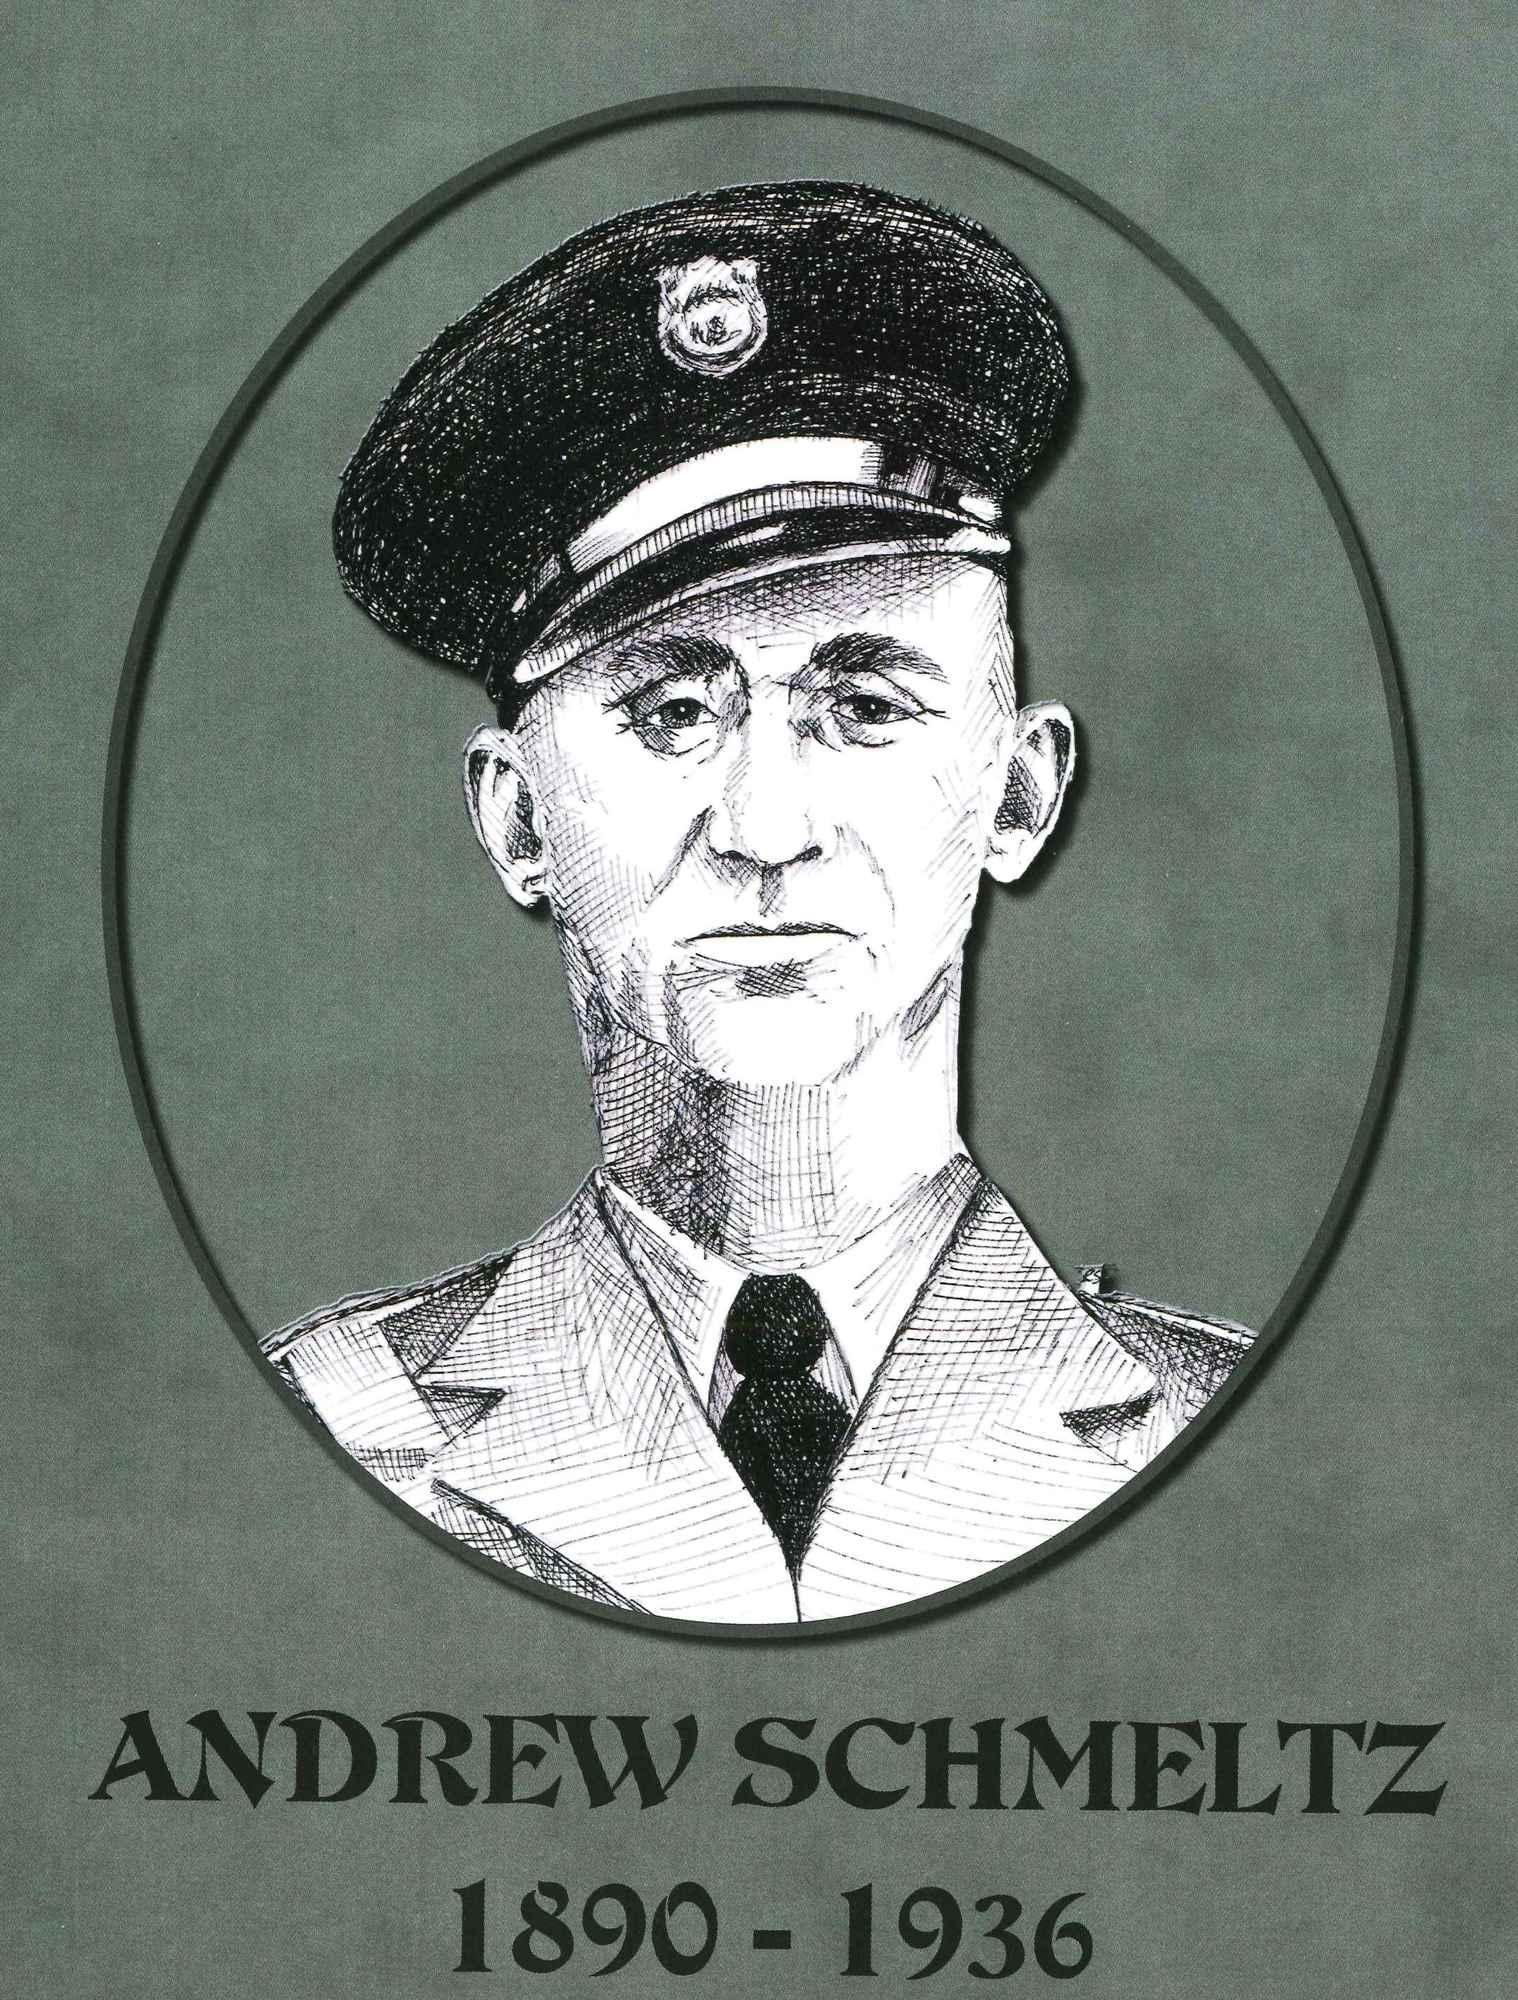 Sketch of Andrew Schmeltz, killed in 1936.